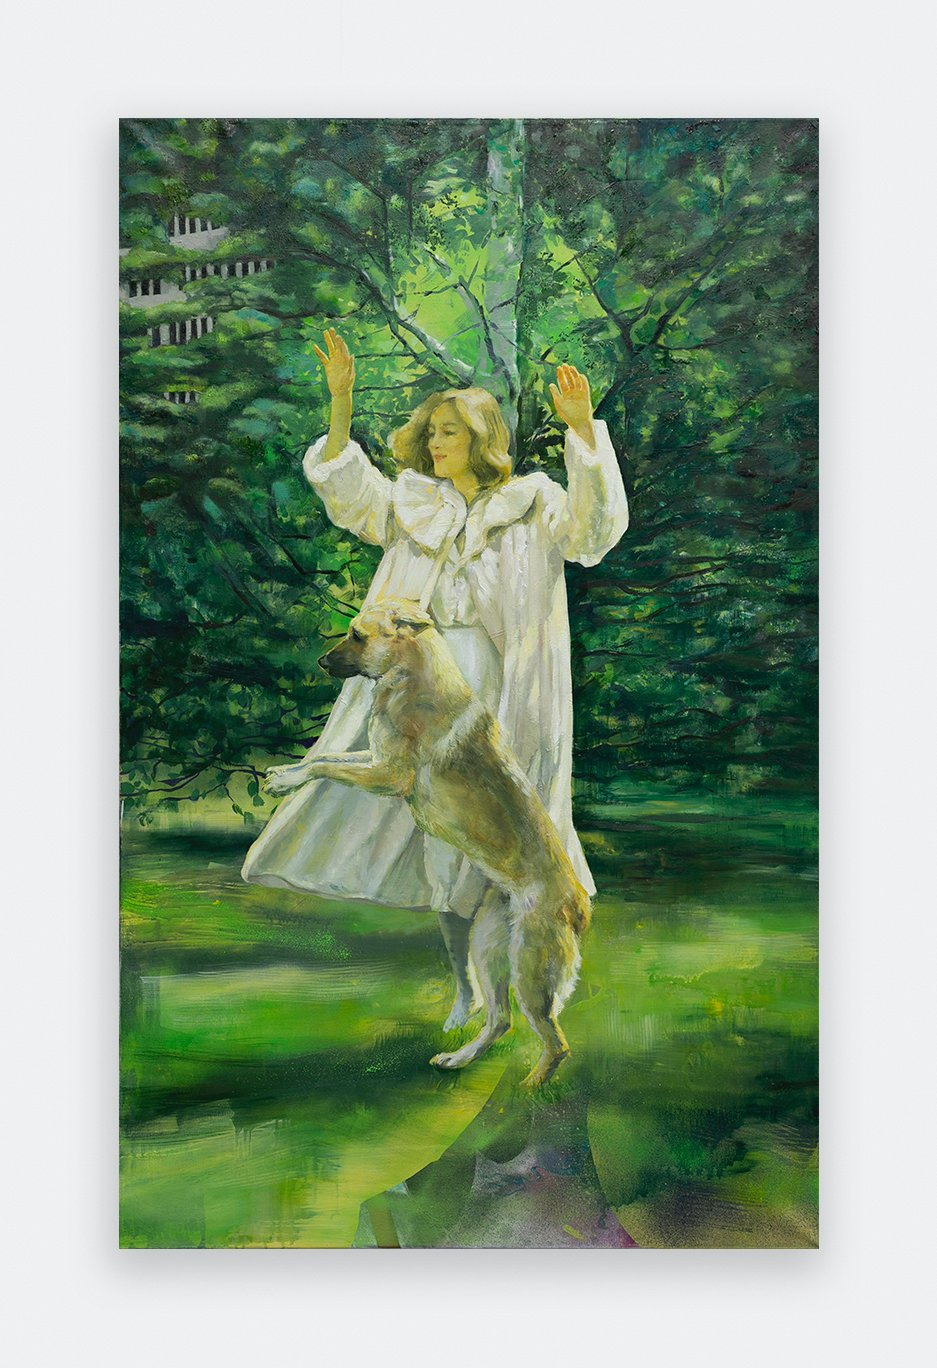 Grazyna, The Modernist